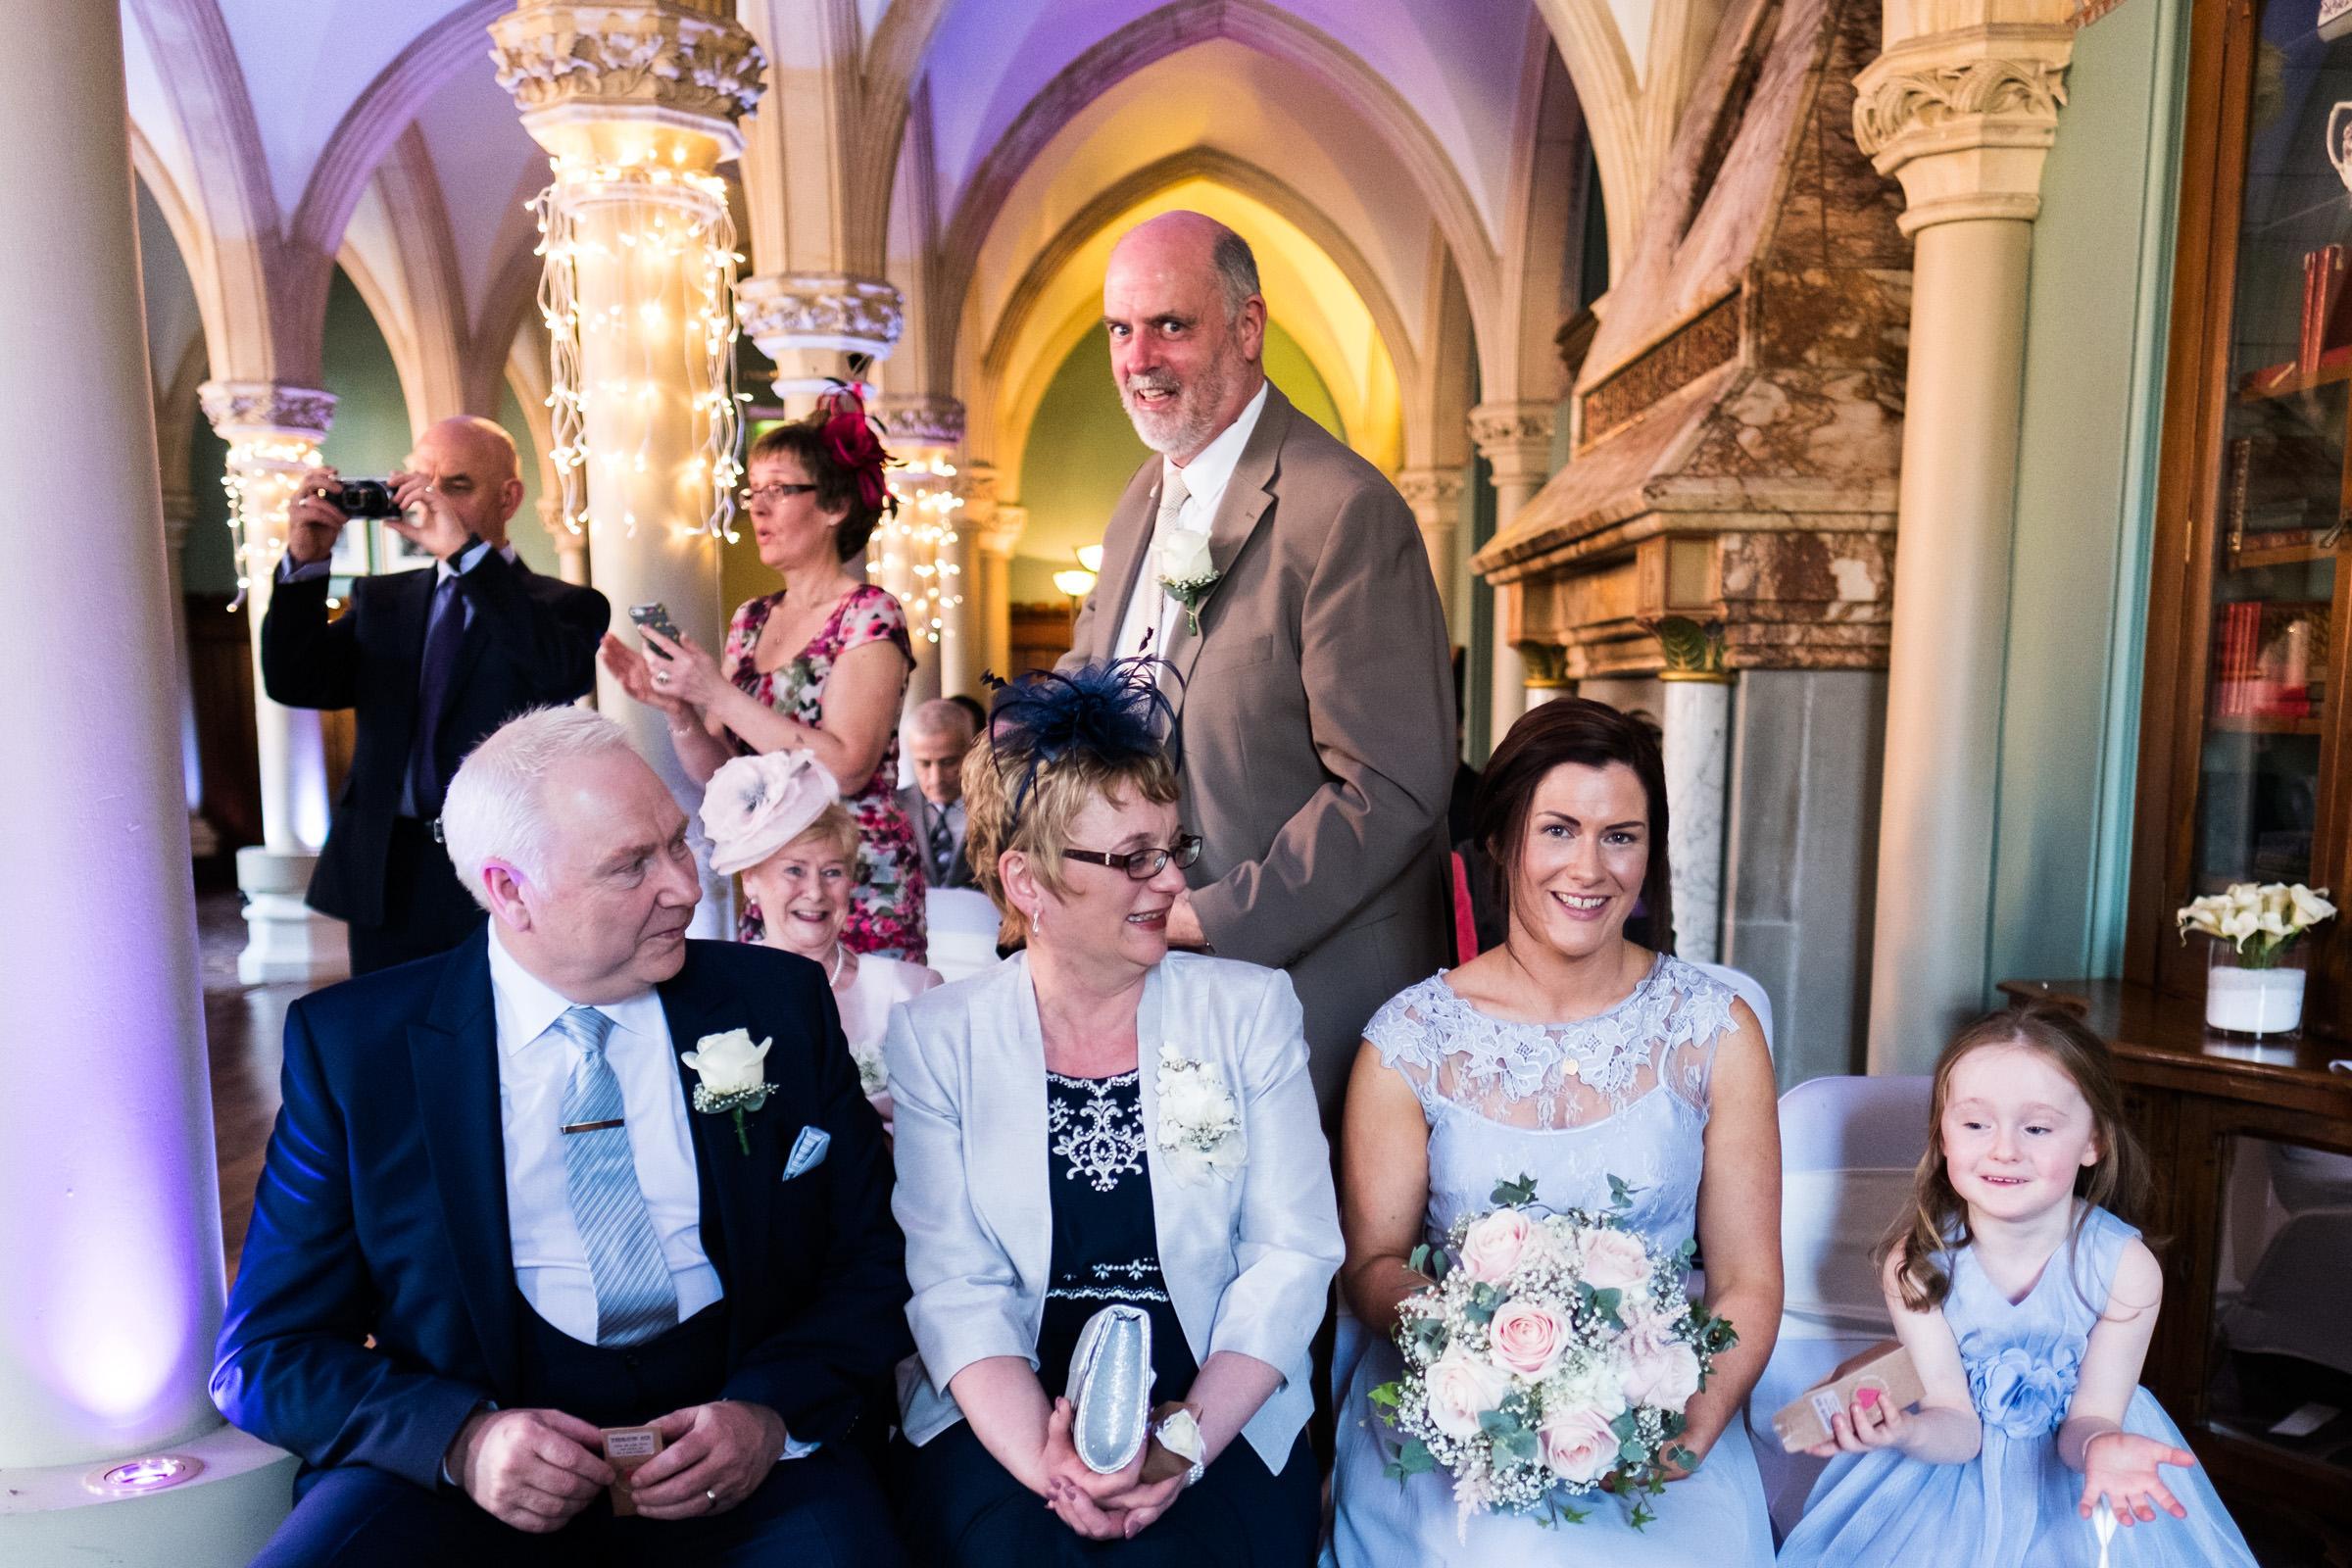 Donna & Nick's Wedding at Wotton House in Dorking 013.jpg